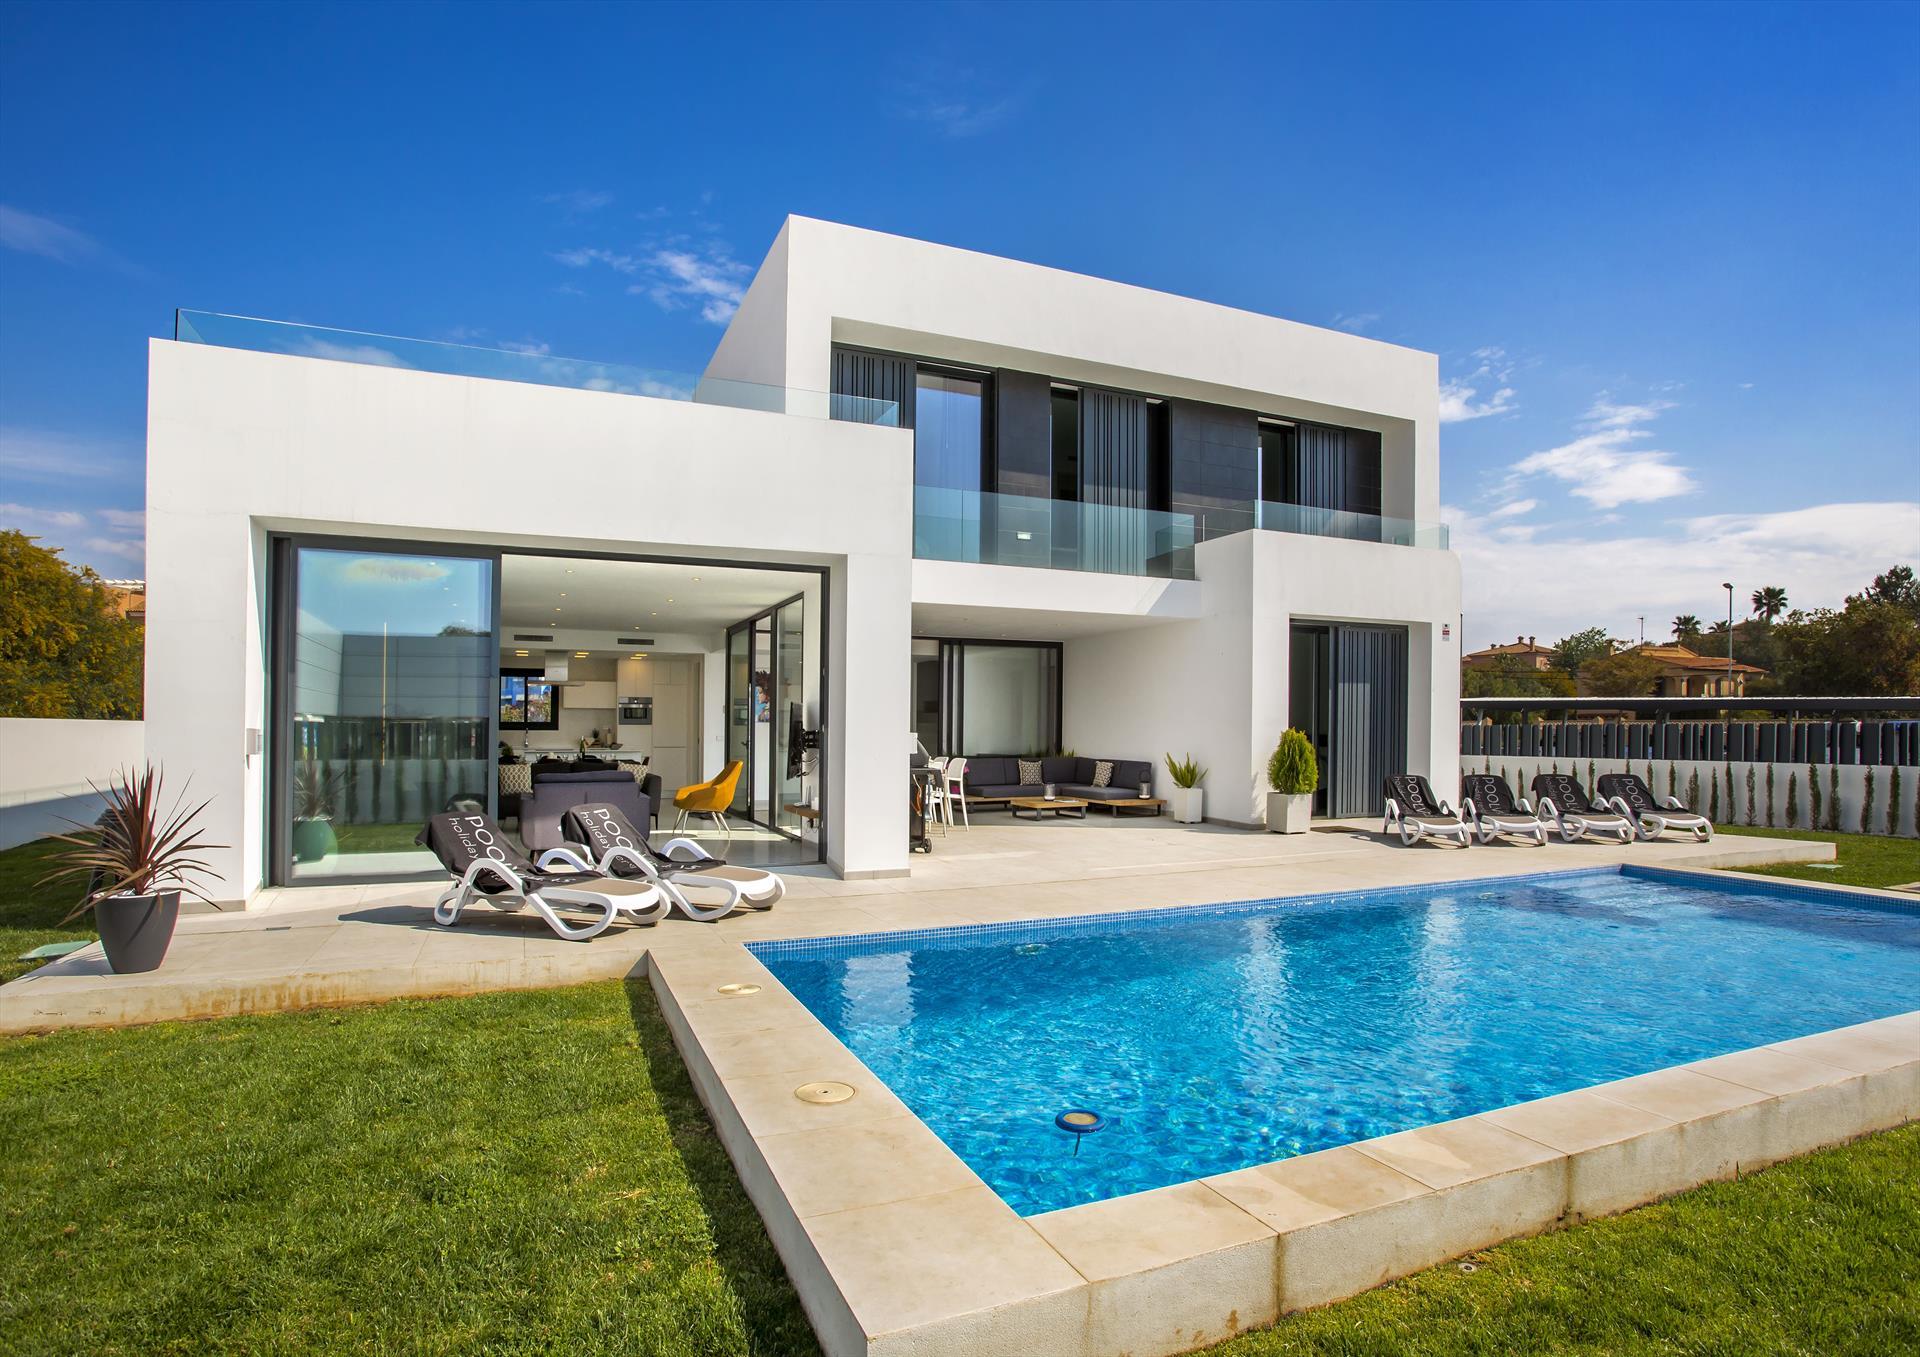 Villa Vaucluse,Calpe,Costa Blanca #1